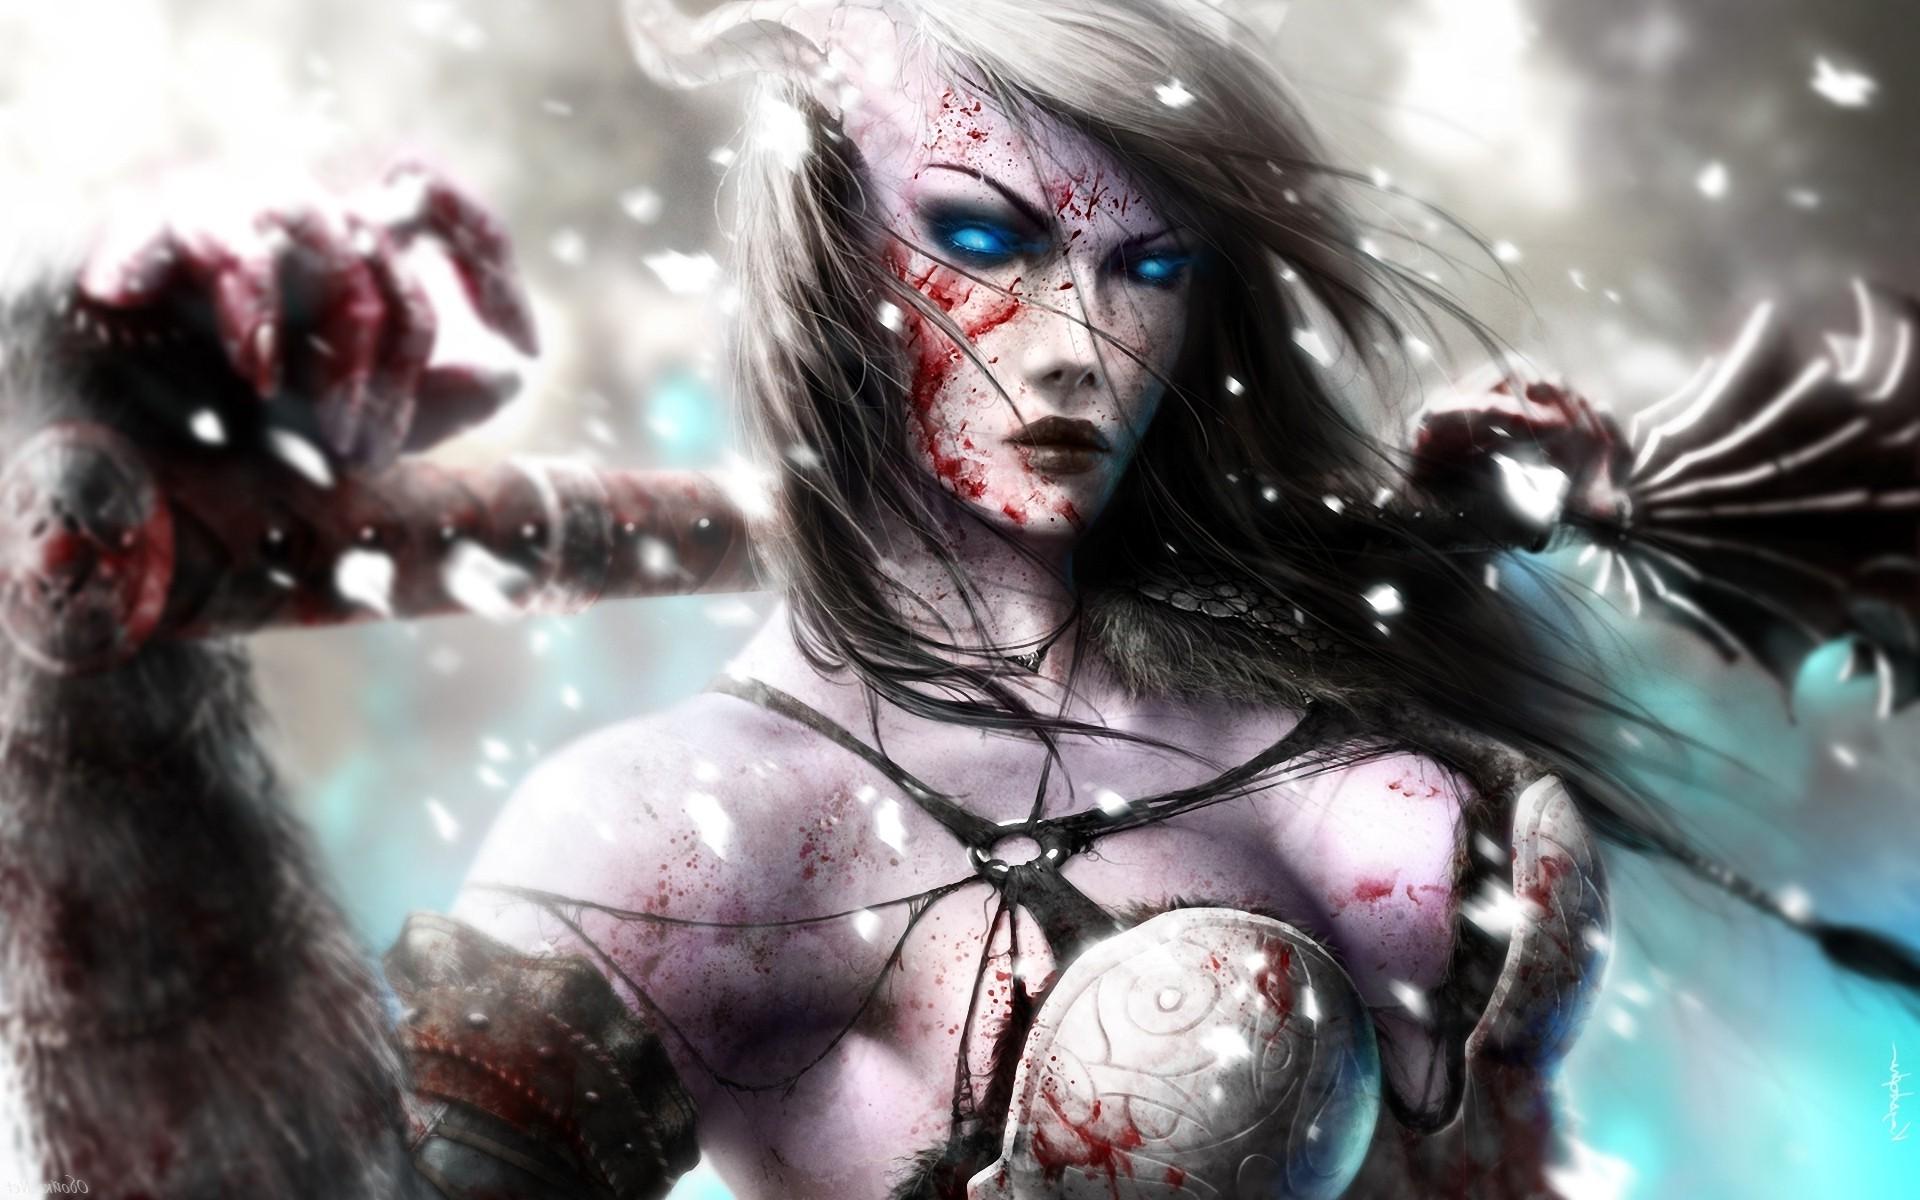 Female dark fantasy smut scene